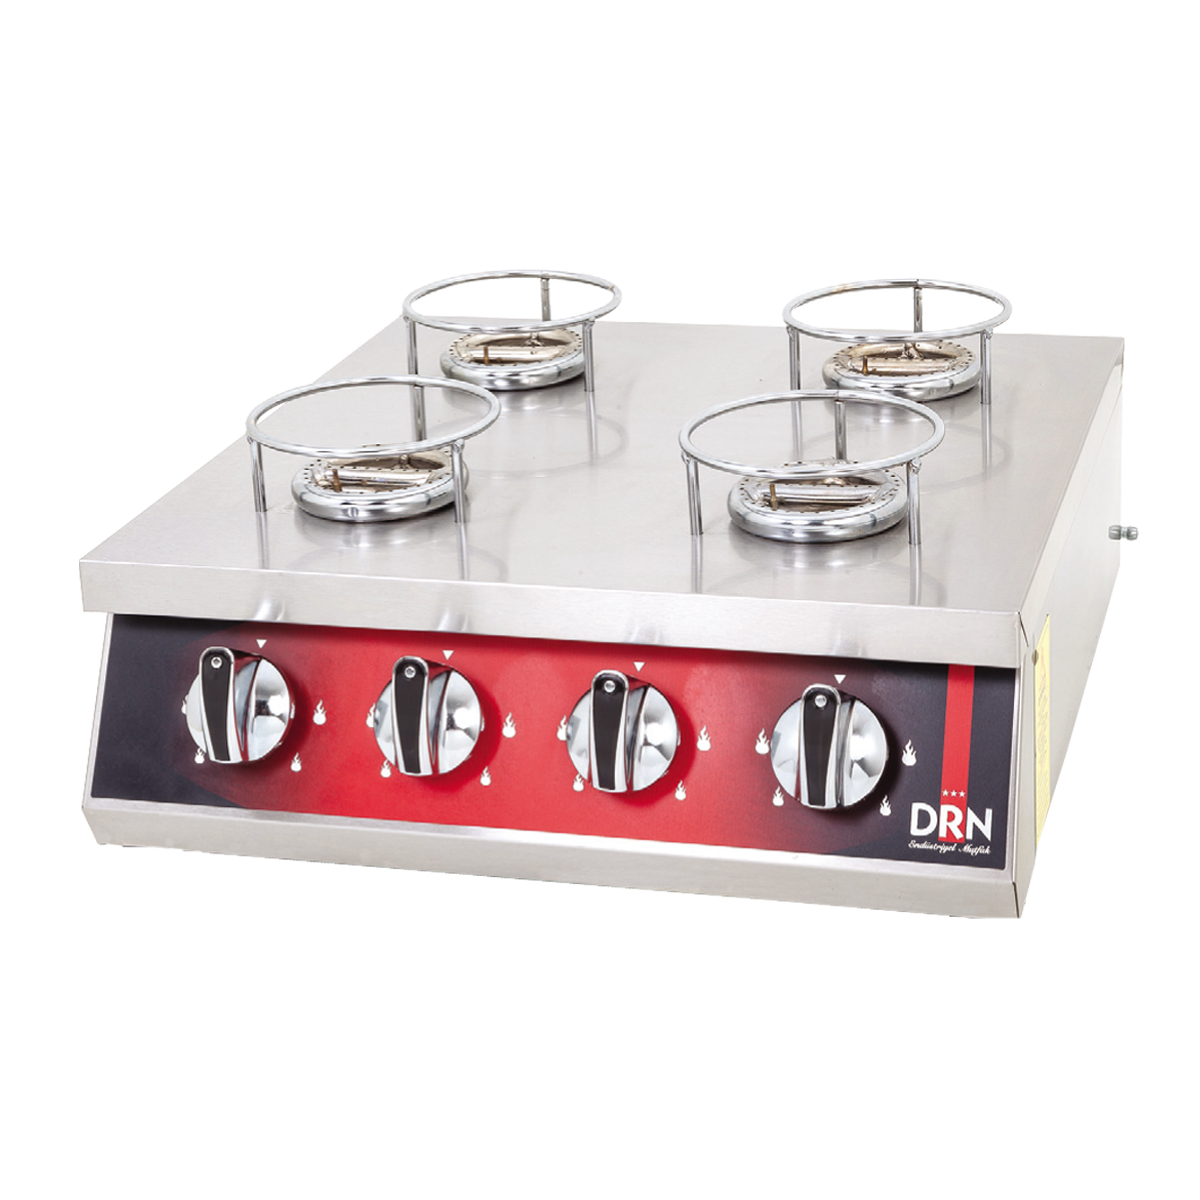 Kunefe Cooker - 4 Burners - Gas